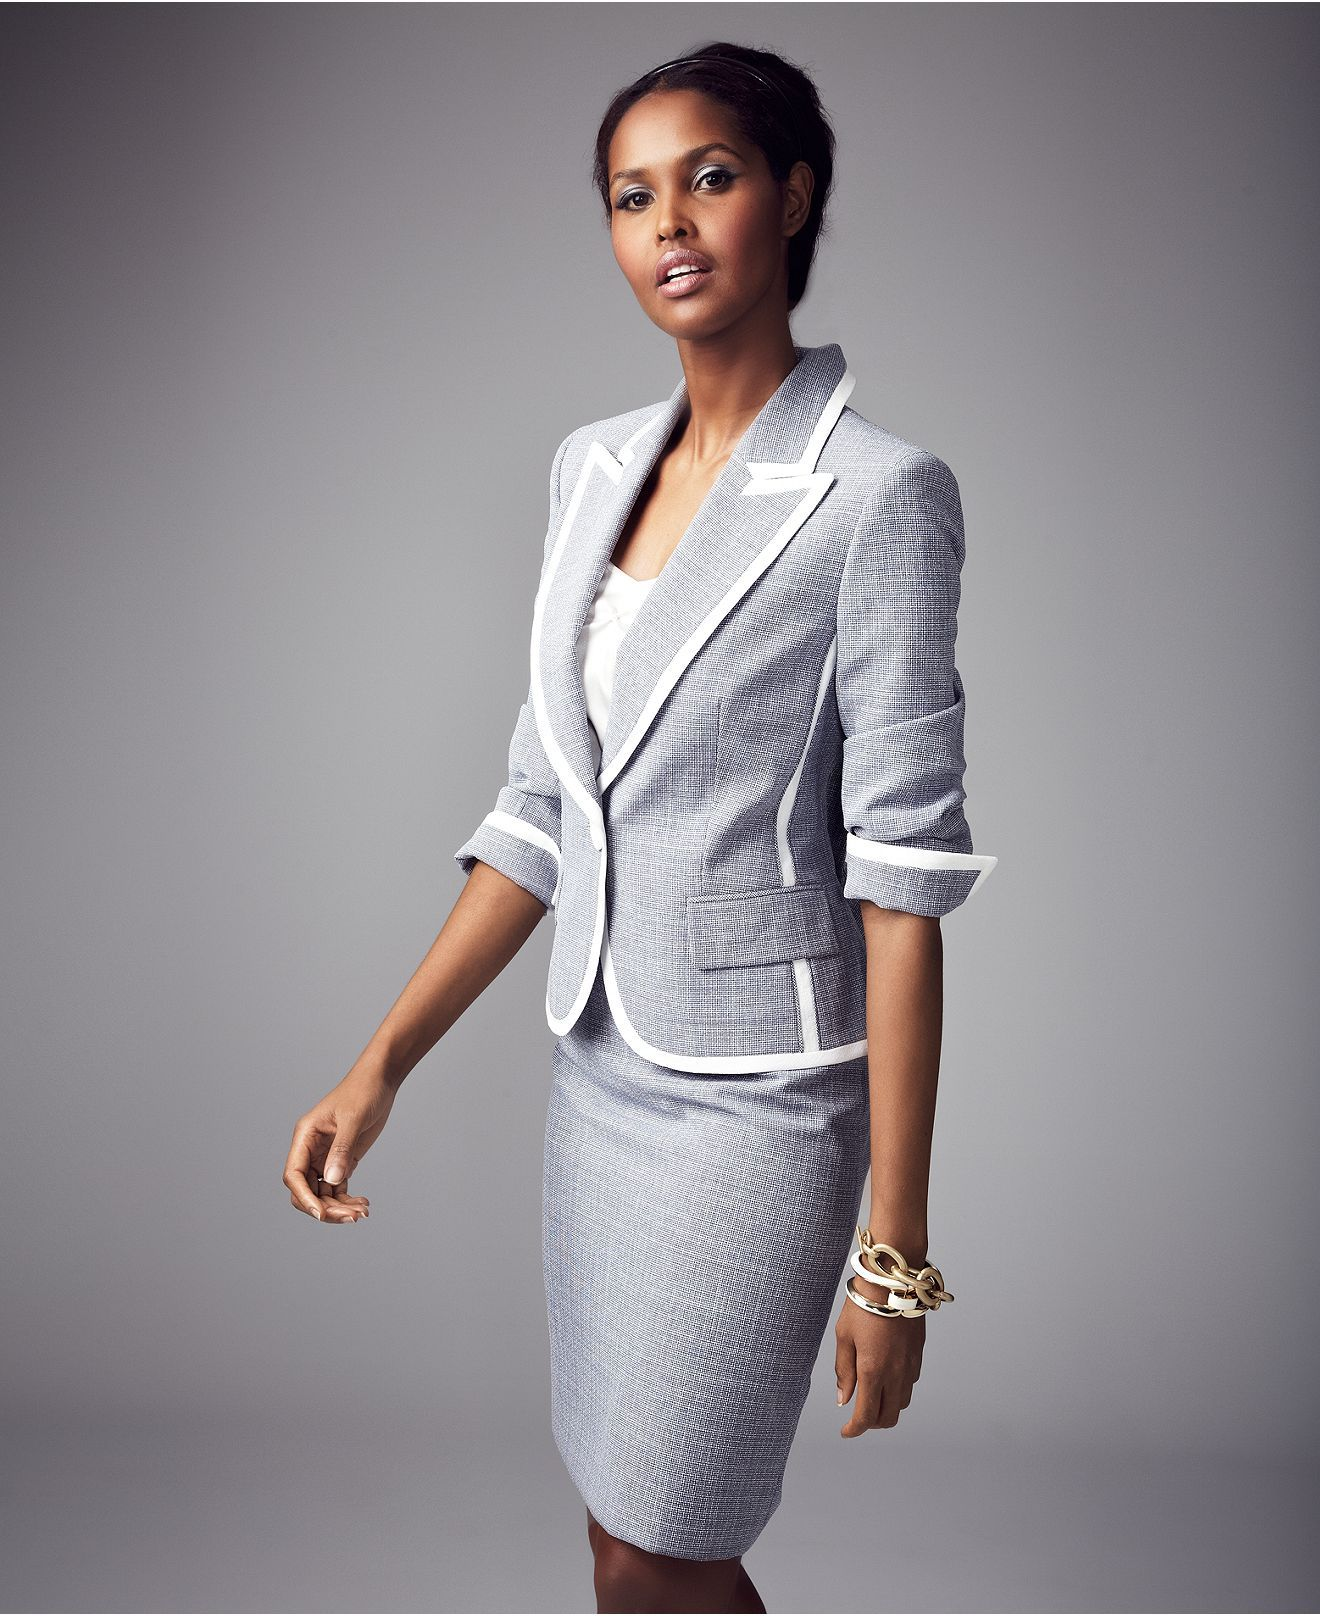 Evan Picone Suit Single Button Tweed Jacket Pencil Skirt Womens